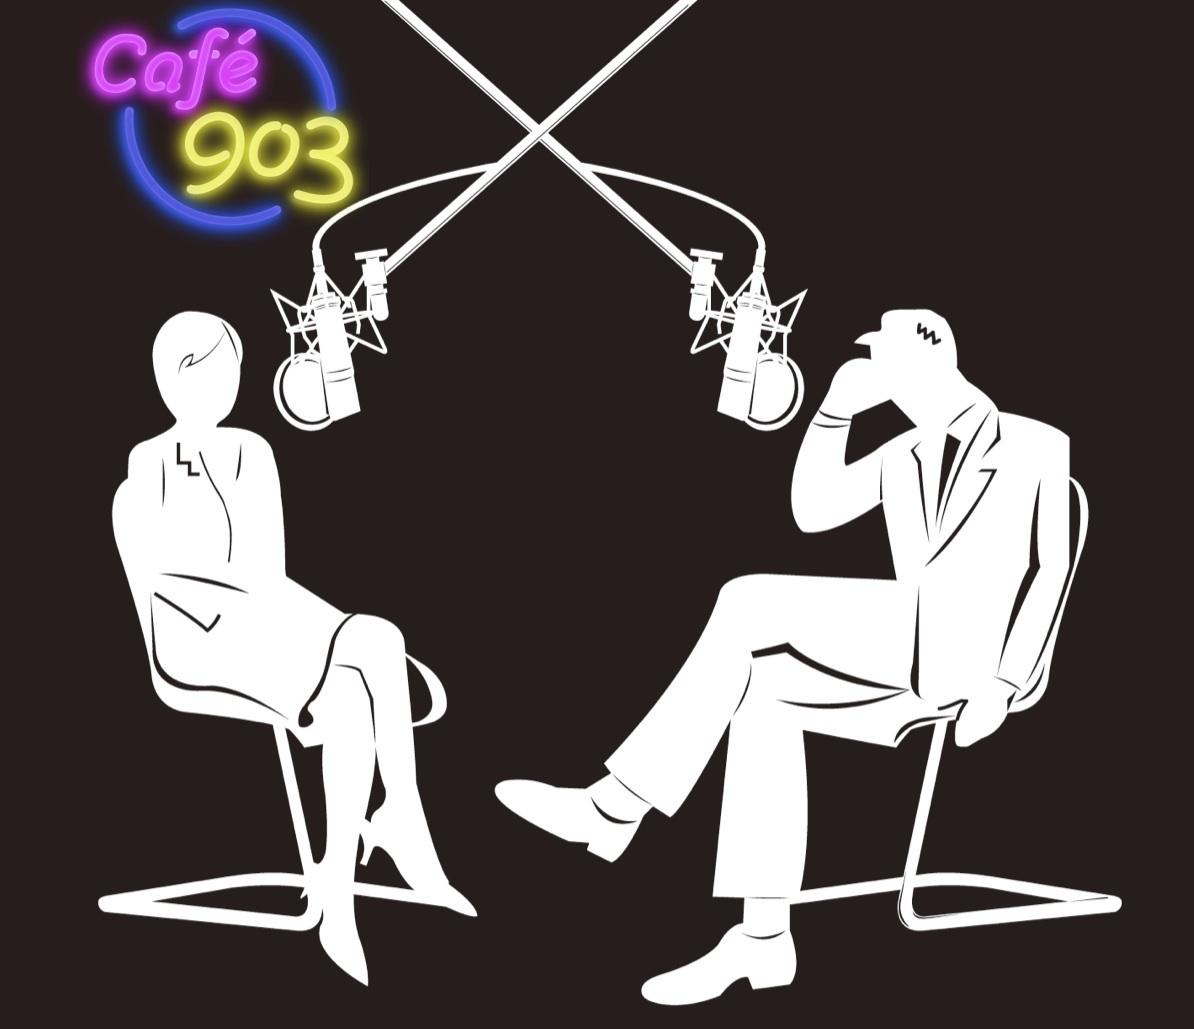 cafe903